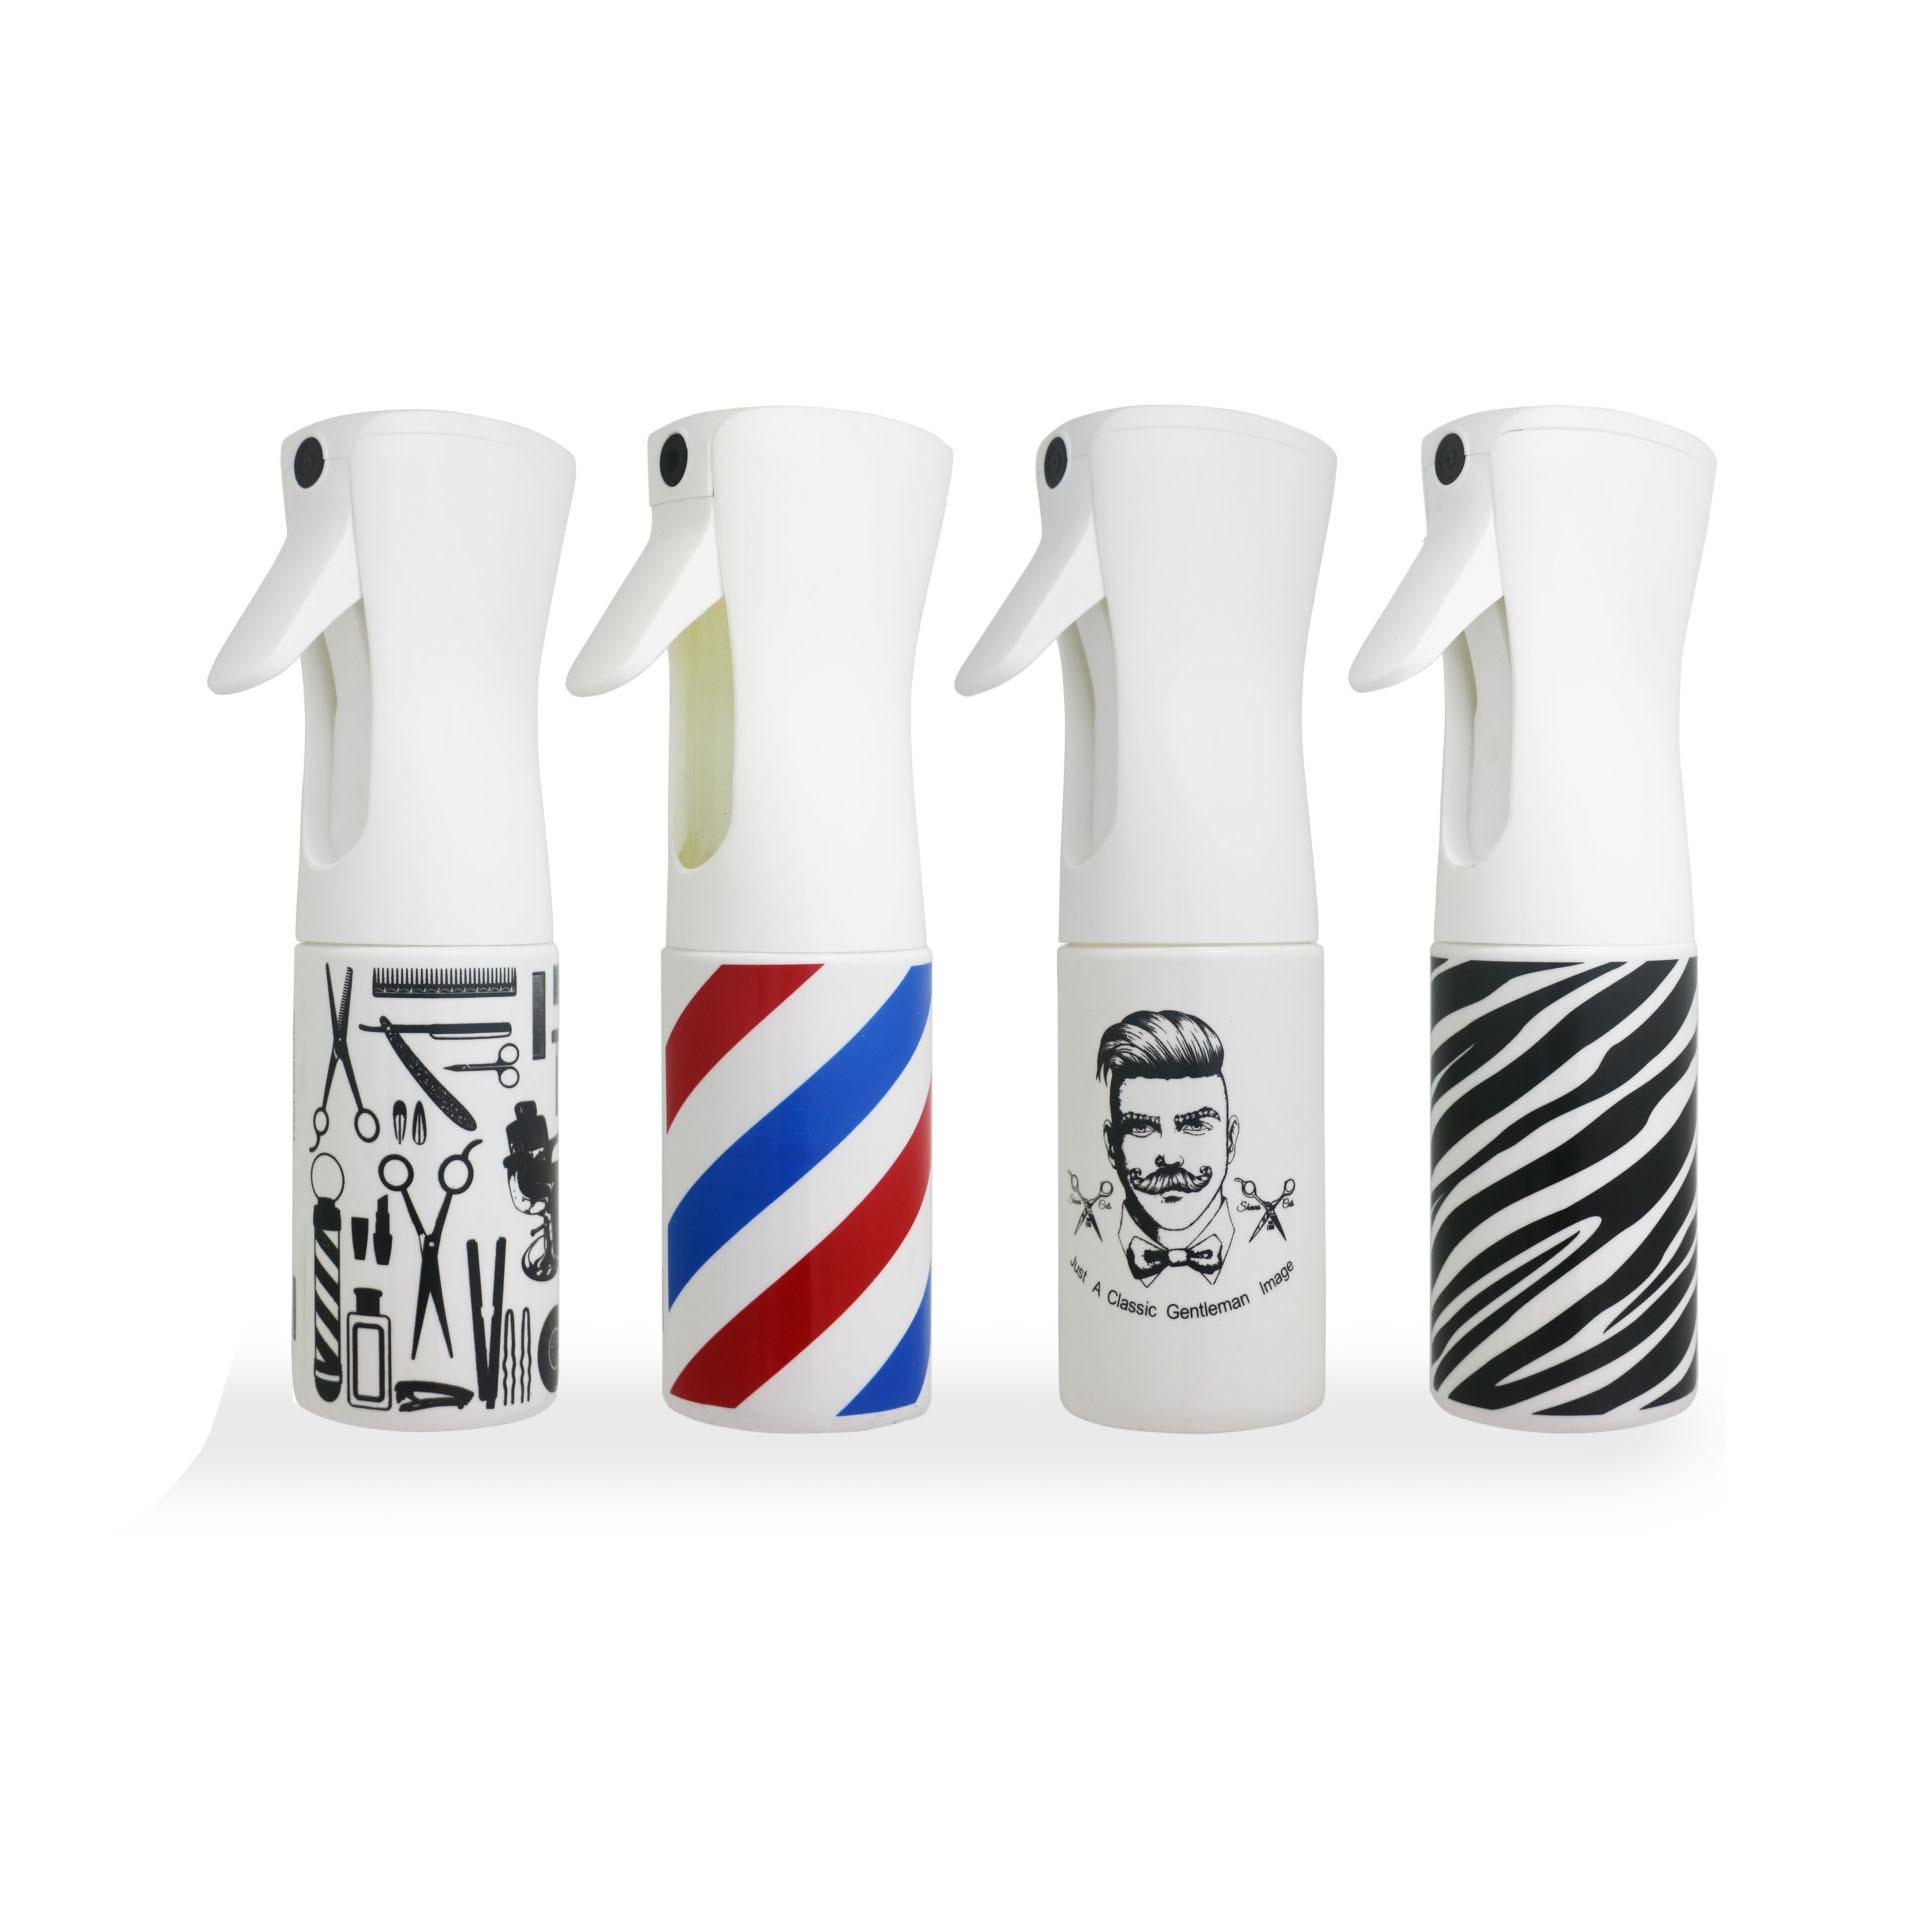 100% Brand New Fashion Hair Spray Bottle 150ML Hairdressing Spray Bottle Salon Barber Hair Tools Water Sprayer Beauty Hair Care